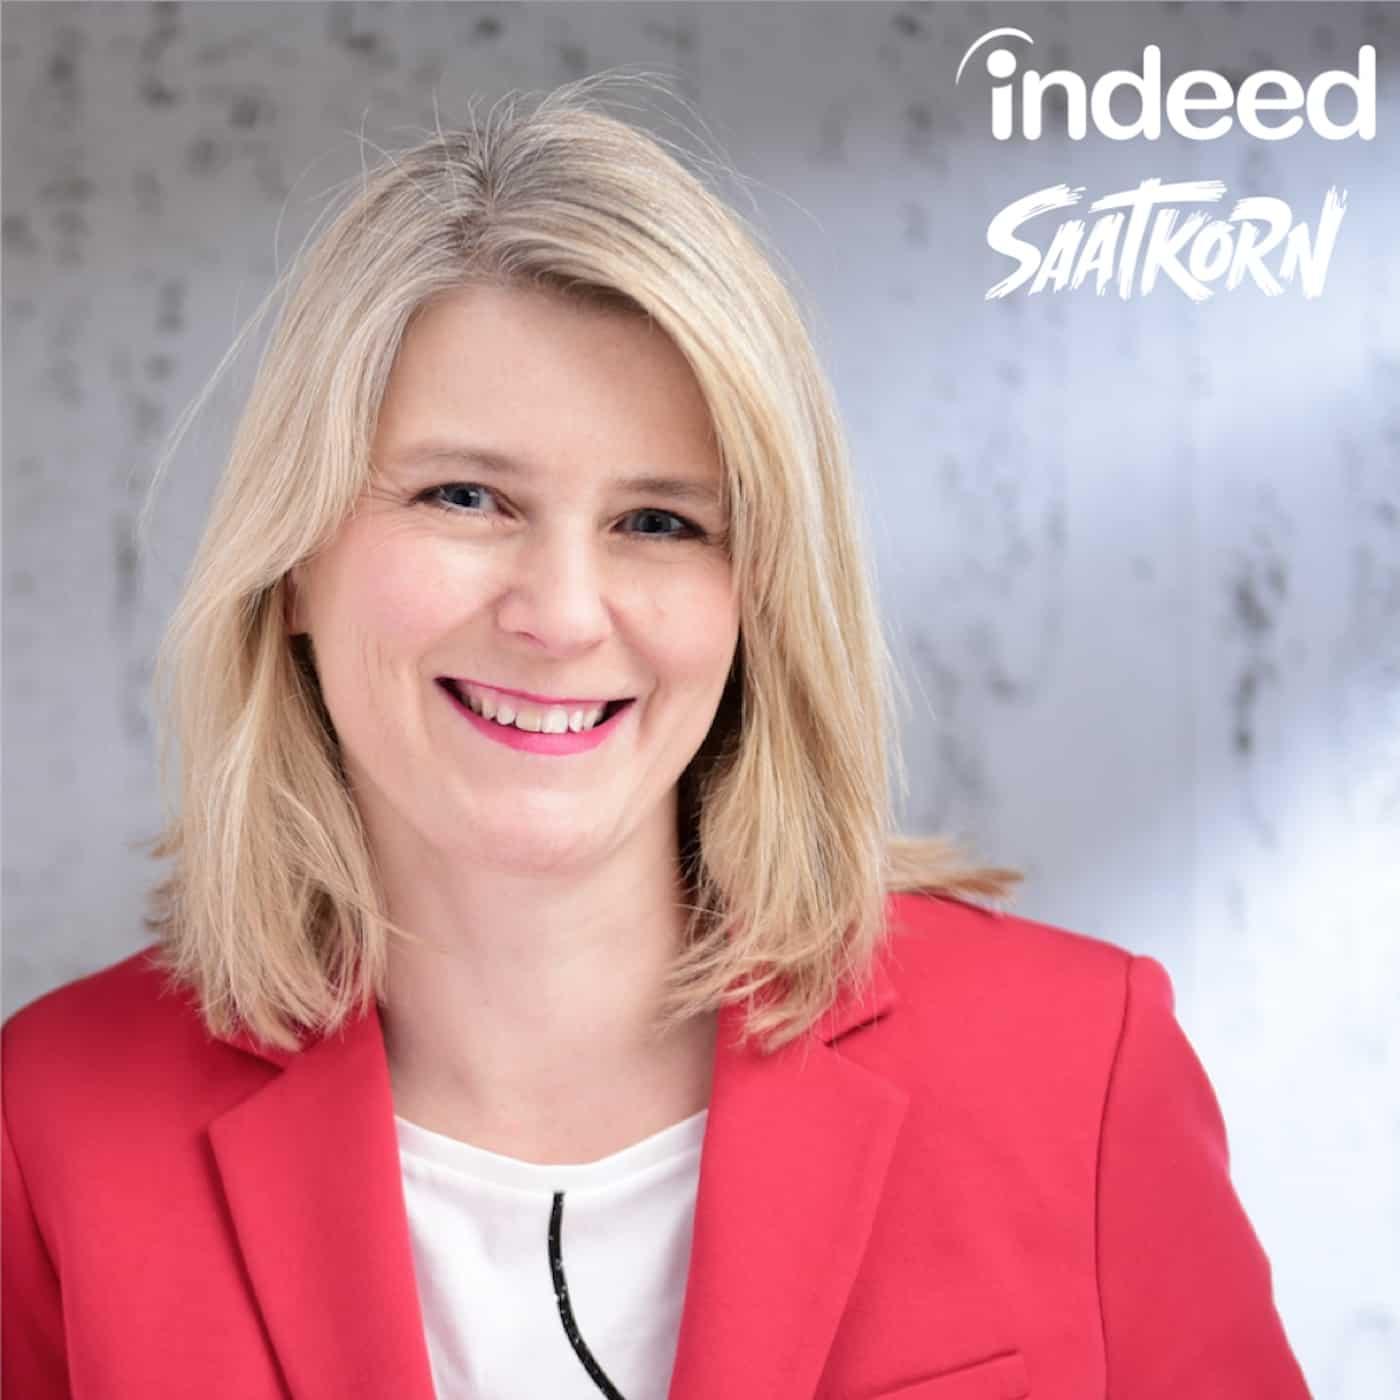 Face the Change Indeed Saatkorn Prof Dr Nicole Richter